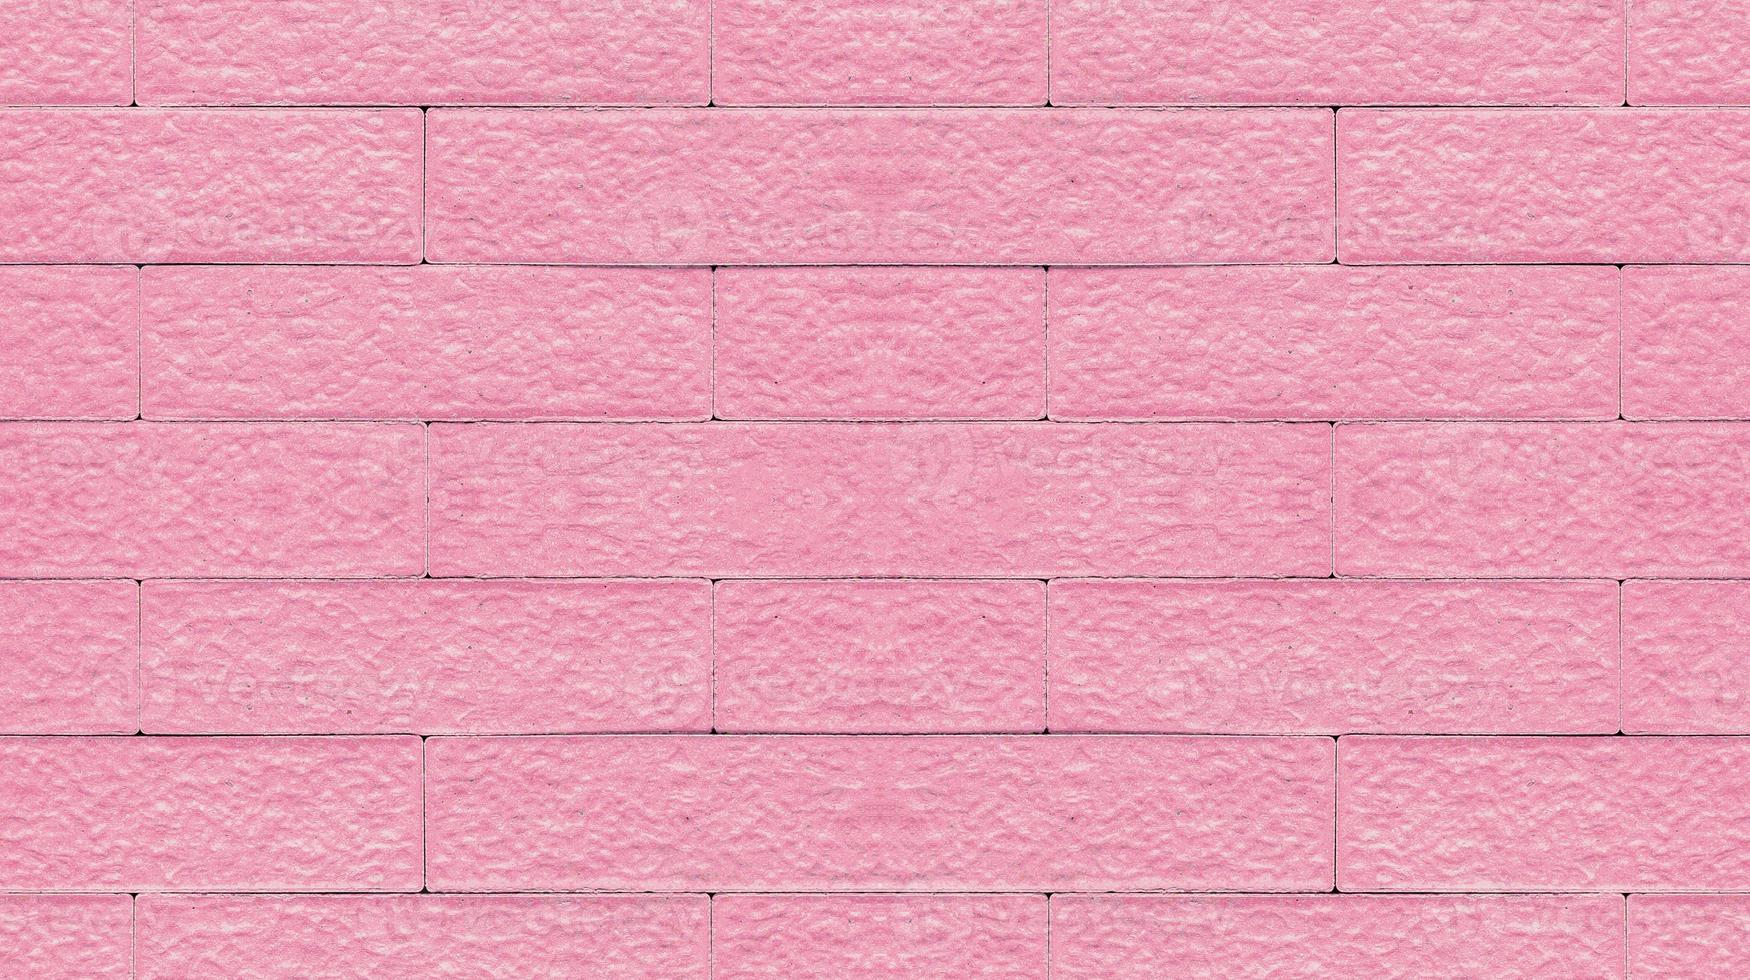 textura de fondo de hormigón rosa foto